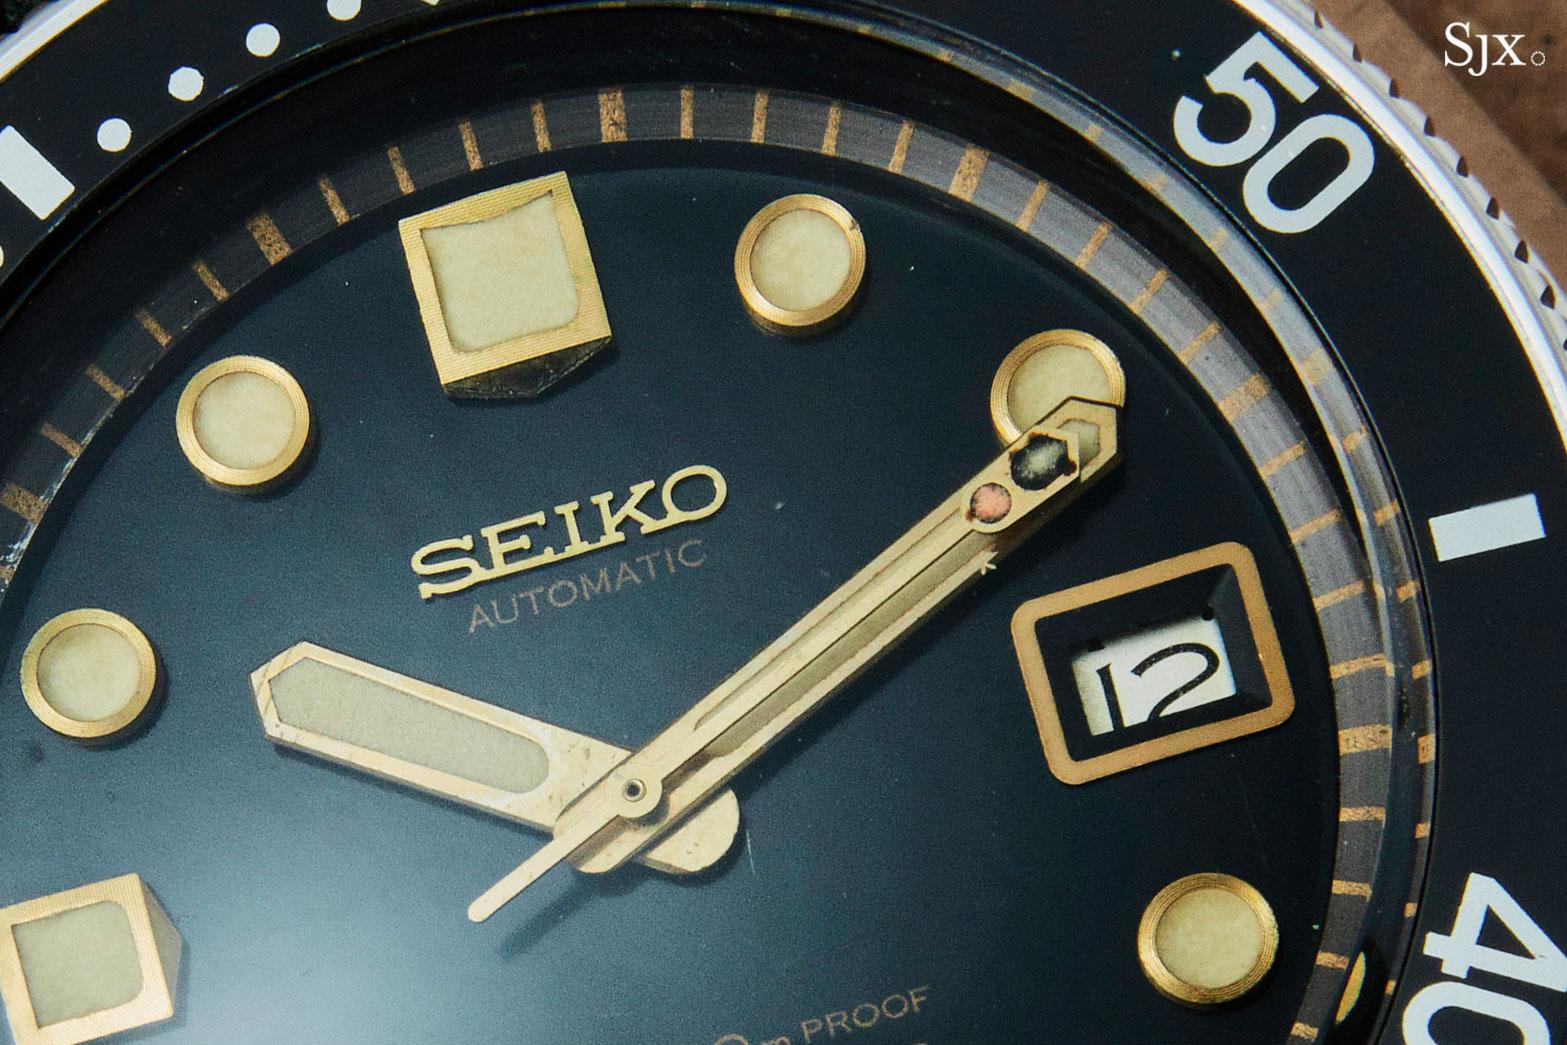 Seiko 300m diver 6215-7000 1